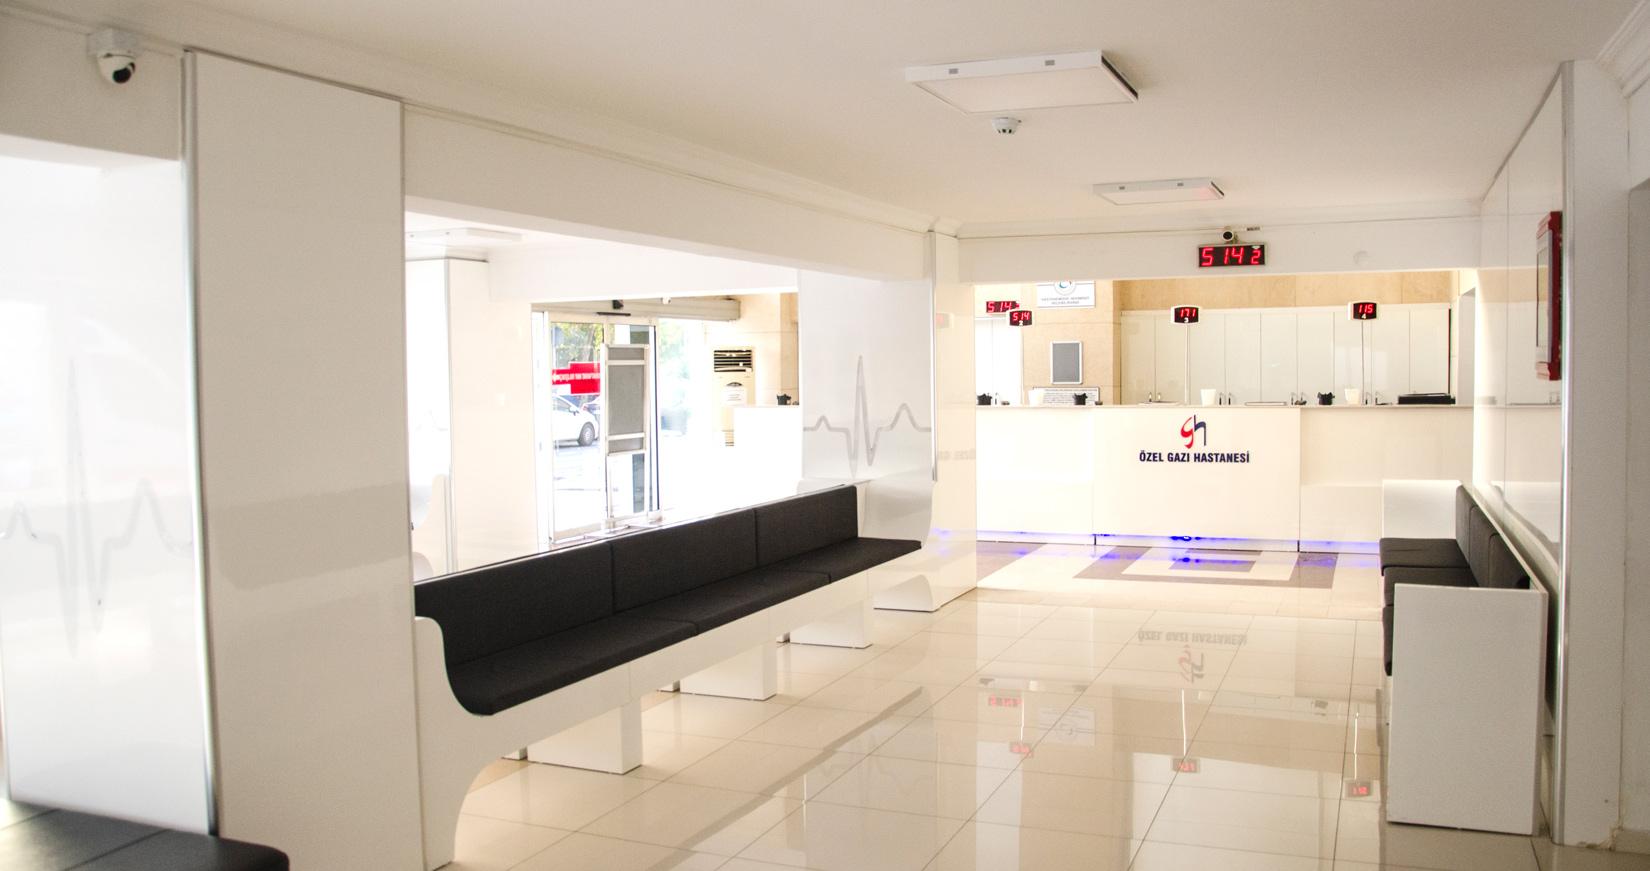 İzmir Private Gazi Hospital